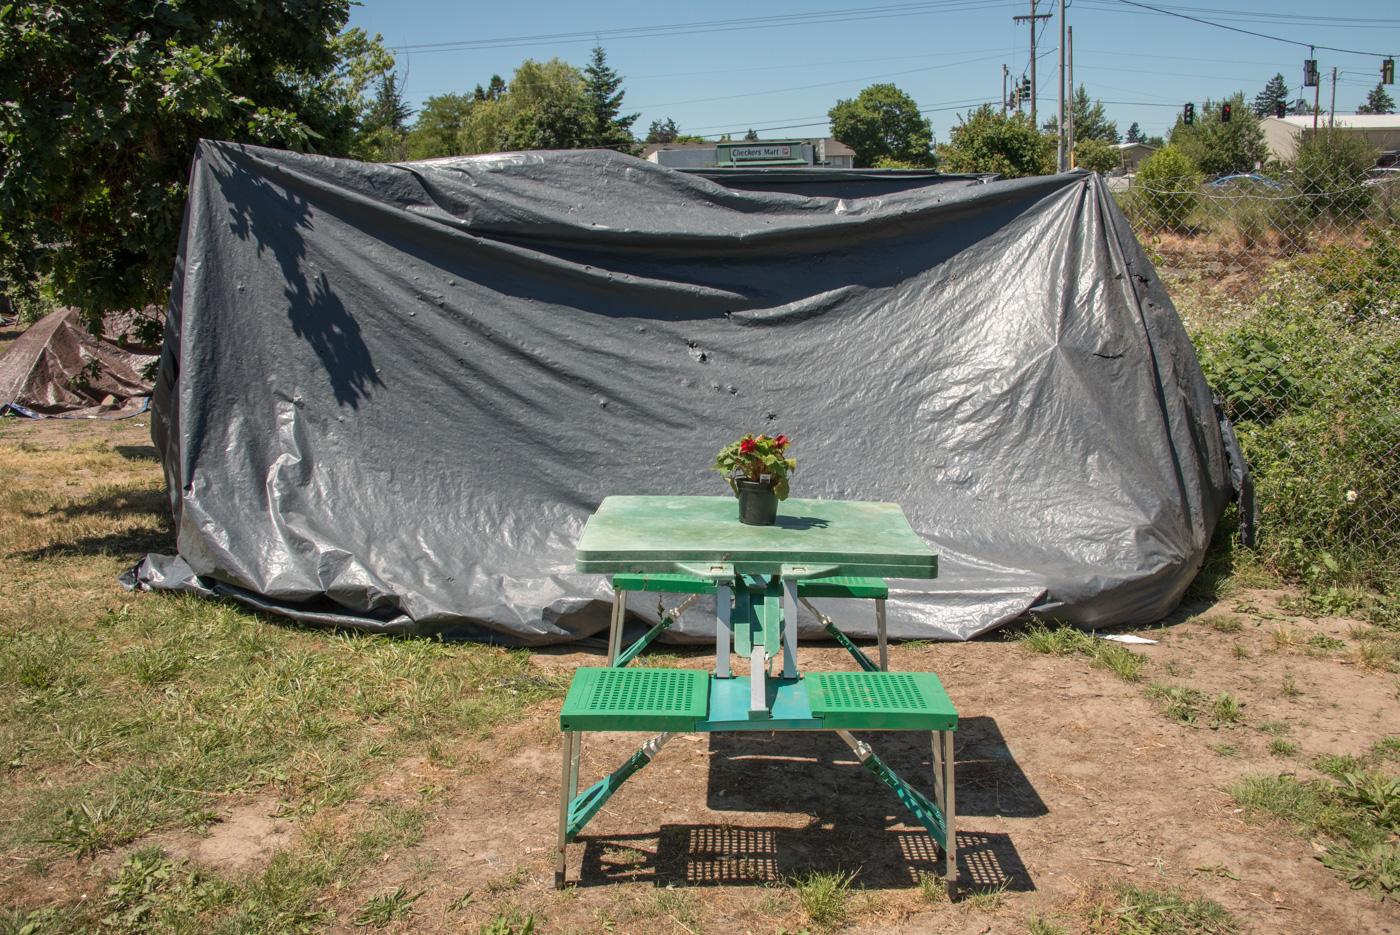 liz obert_usa_urban campers-1.jpg